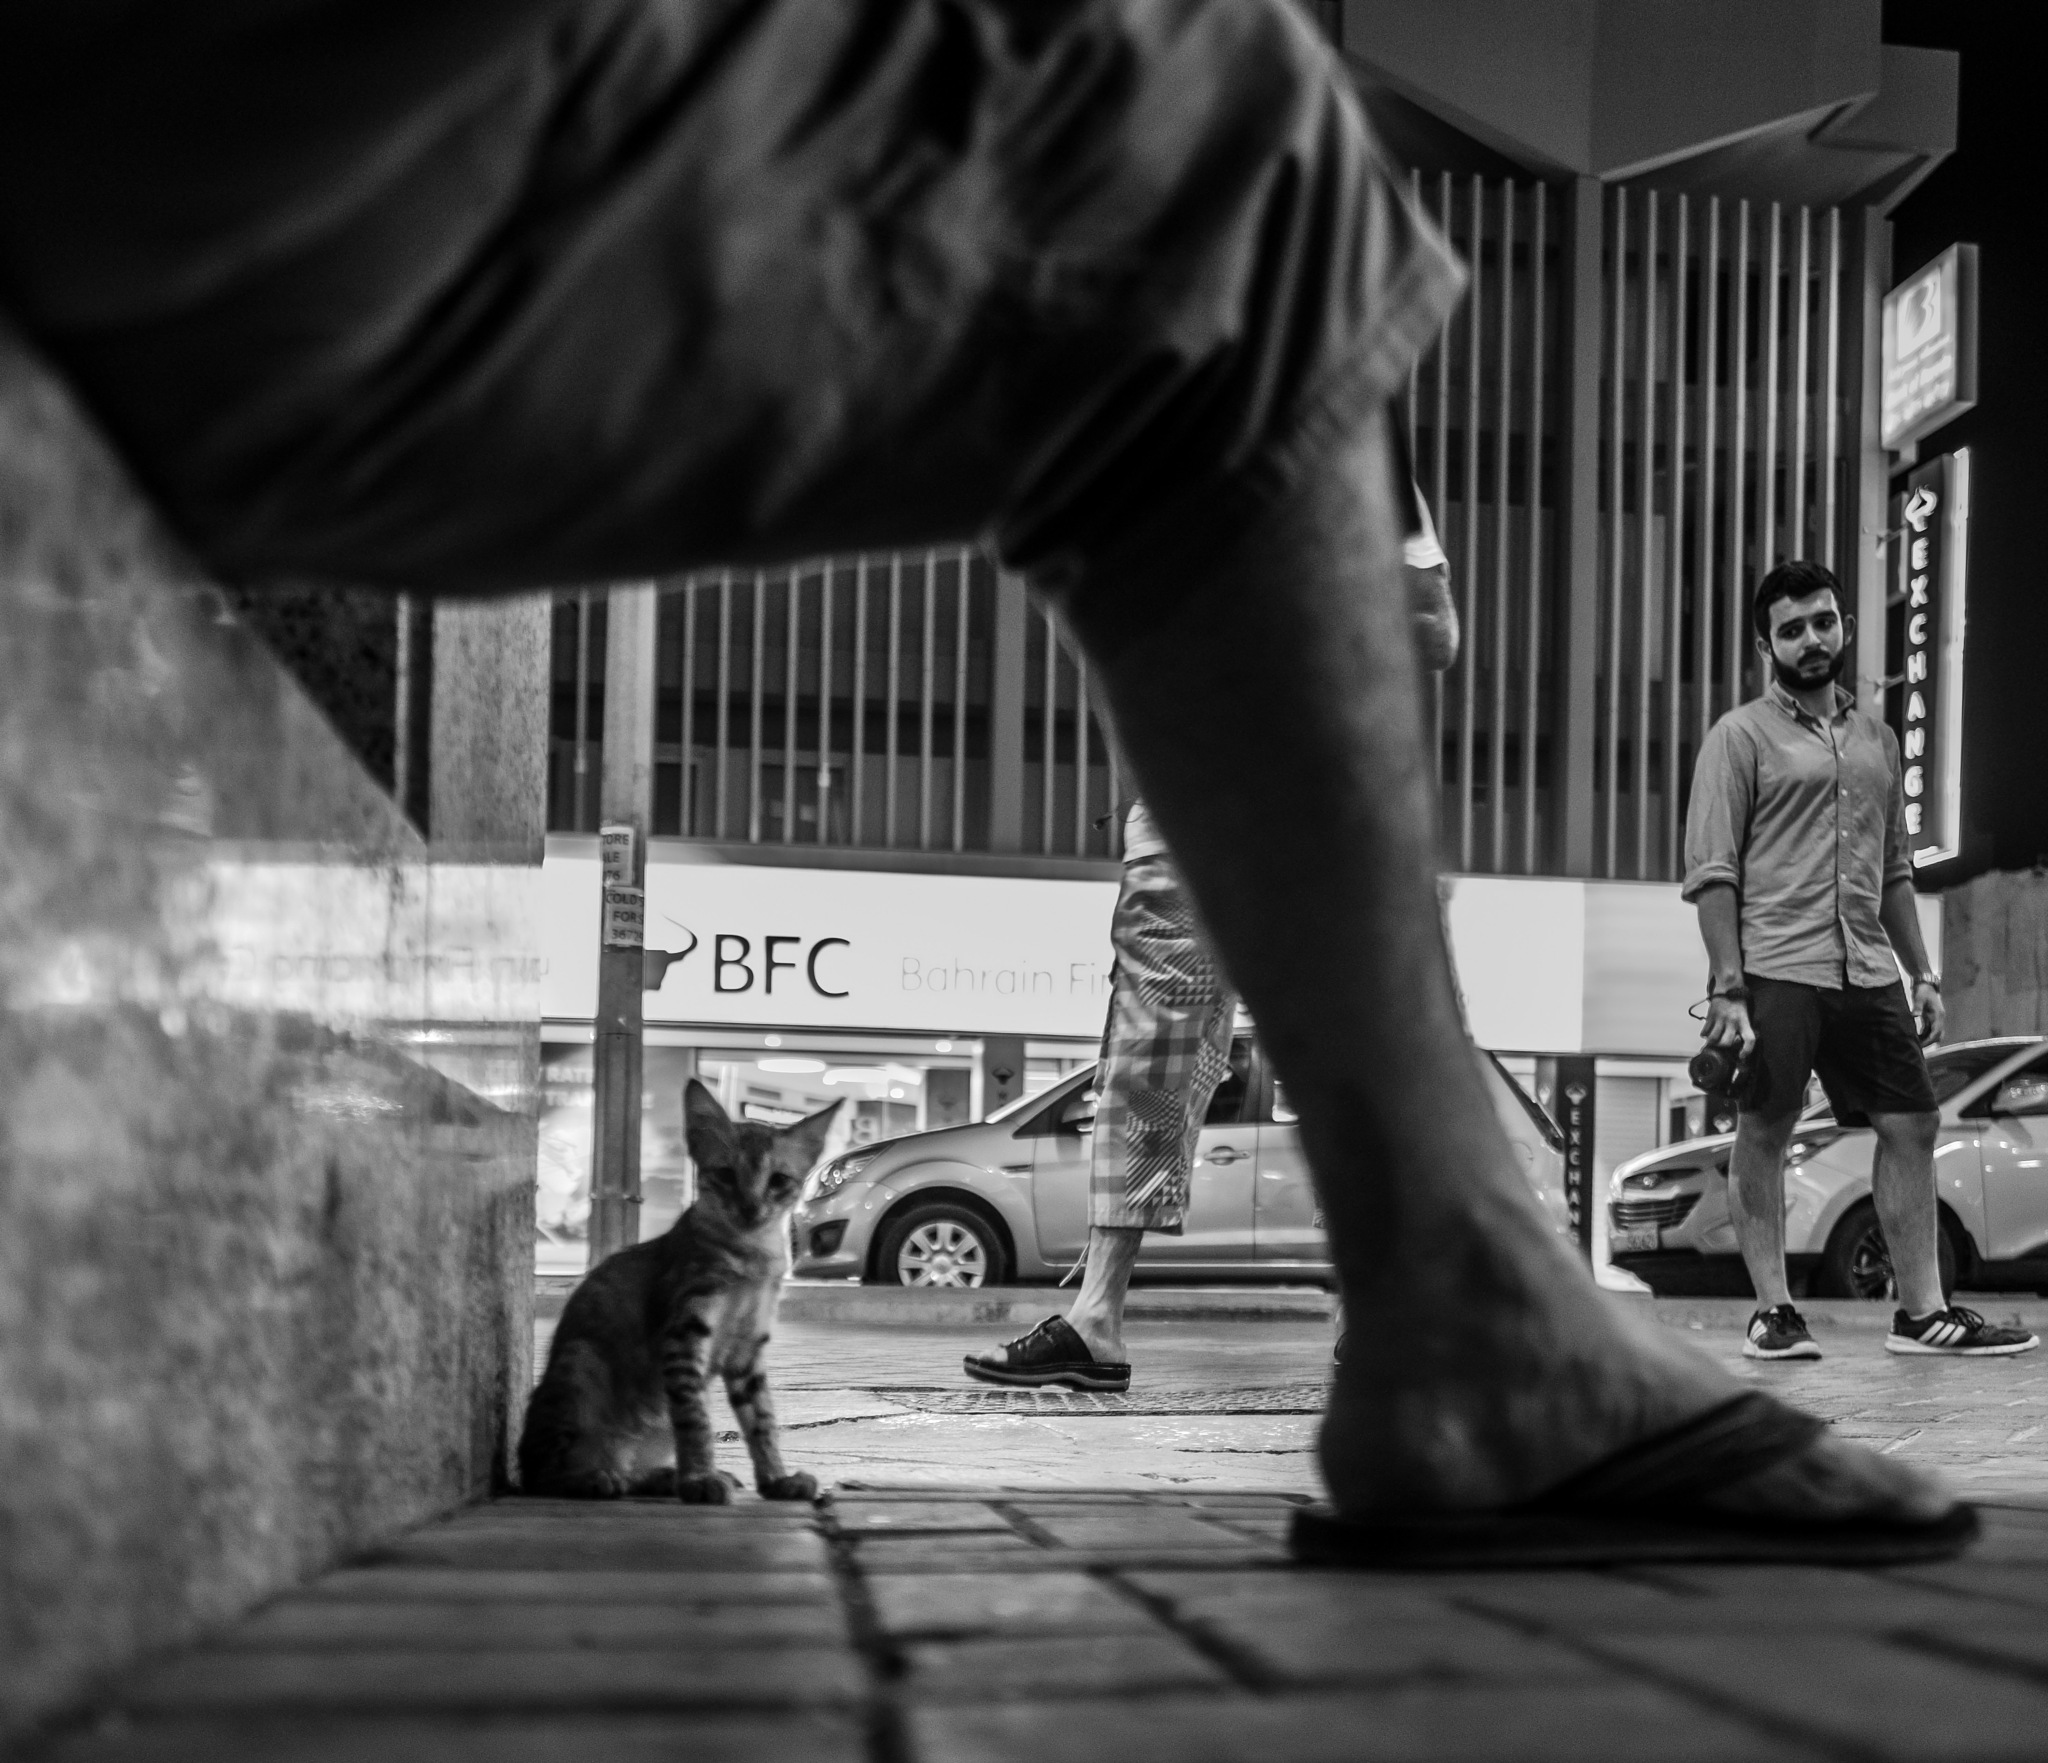 FRAMED by Mustafa Bastaki